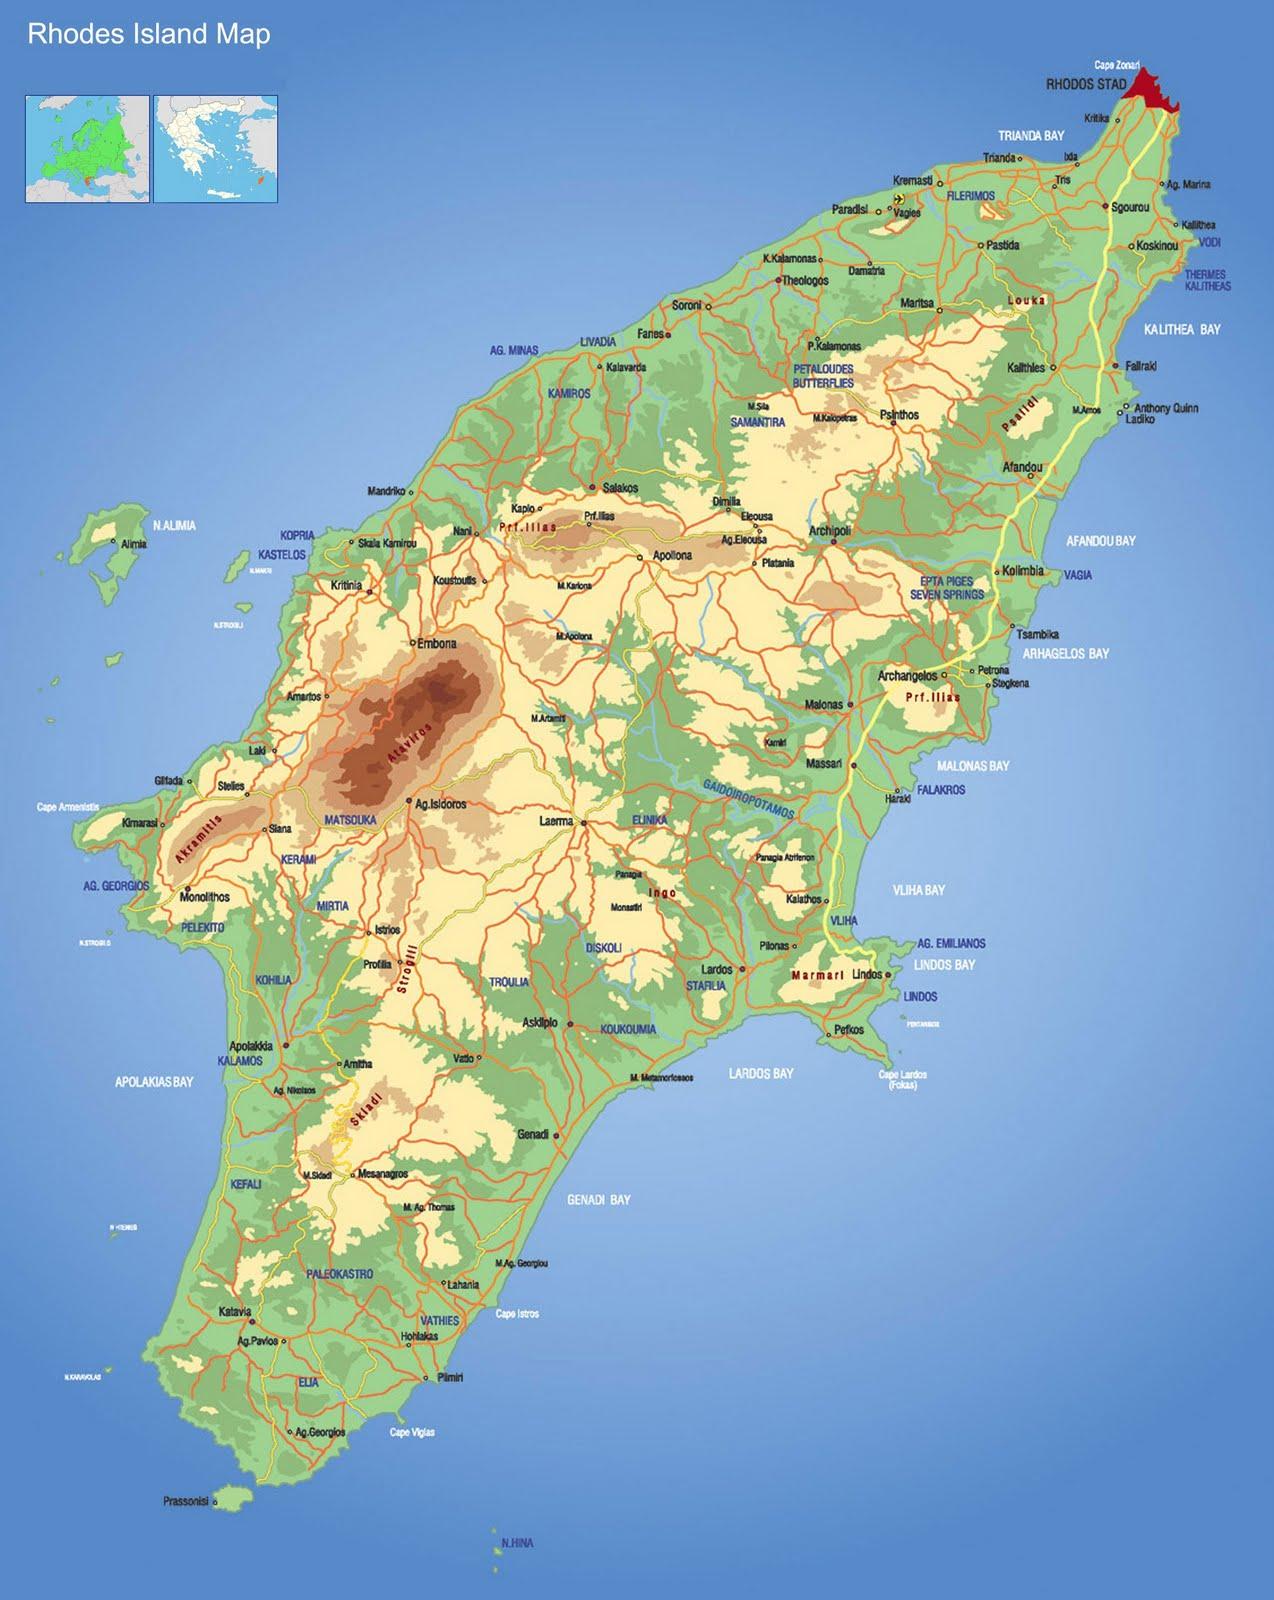 map of rhodes island rodos map xarths rodou greece island rhodes